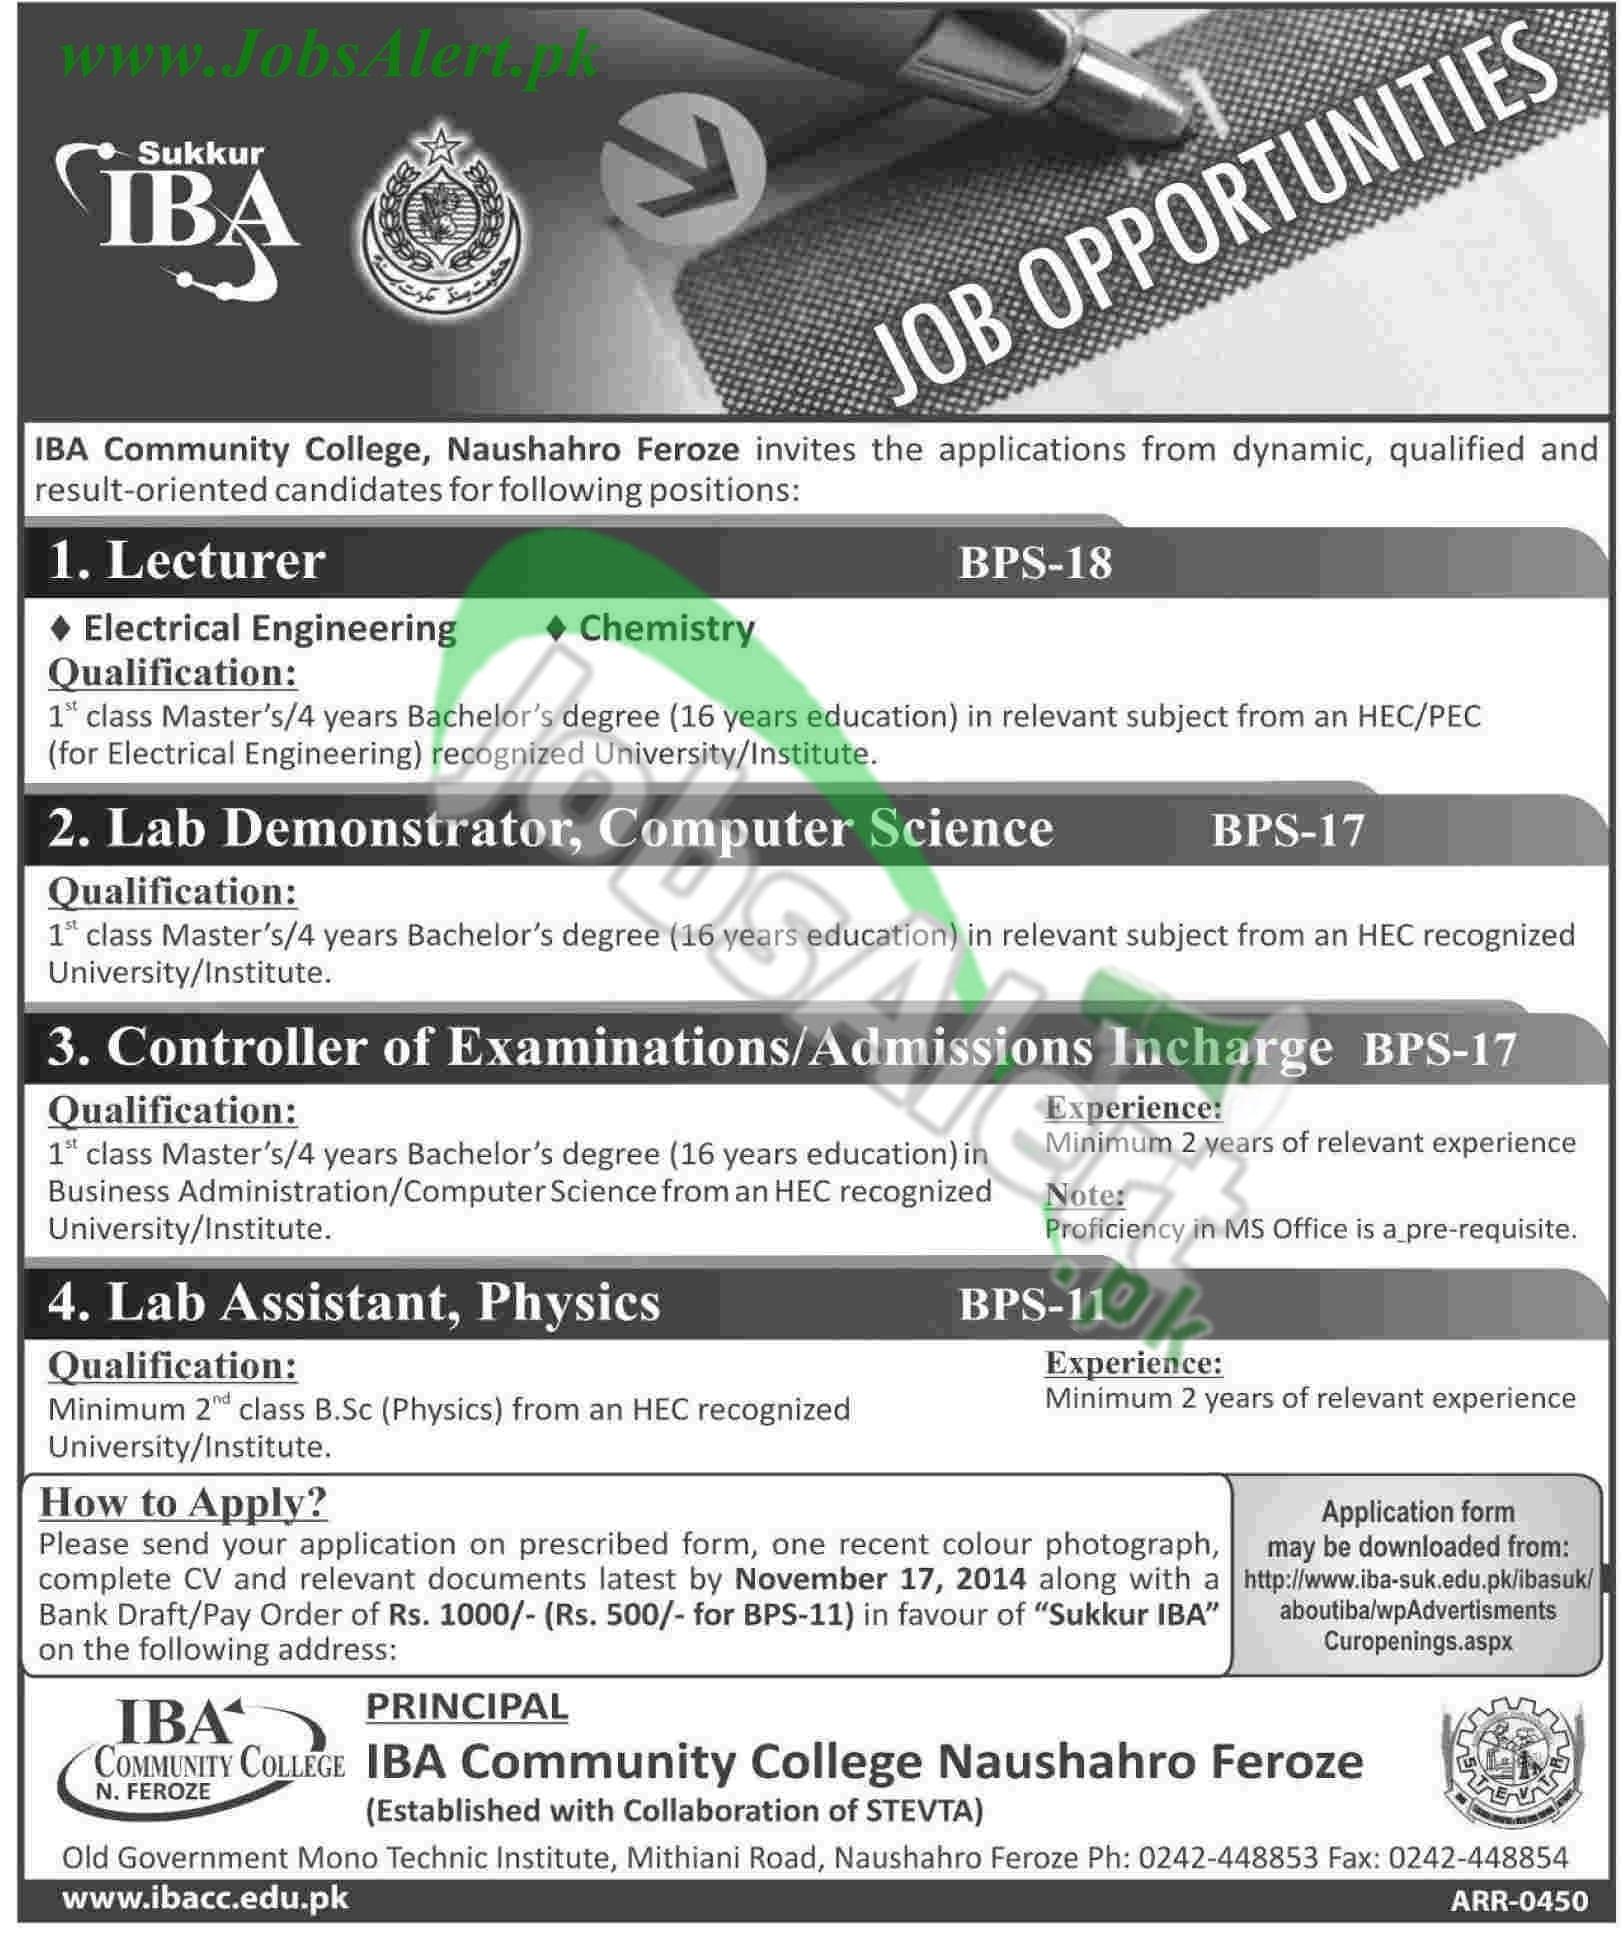 IBA Community College Naushahro Feroze